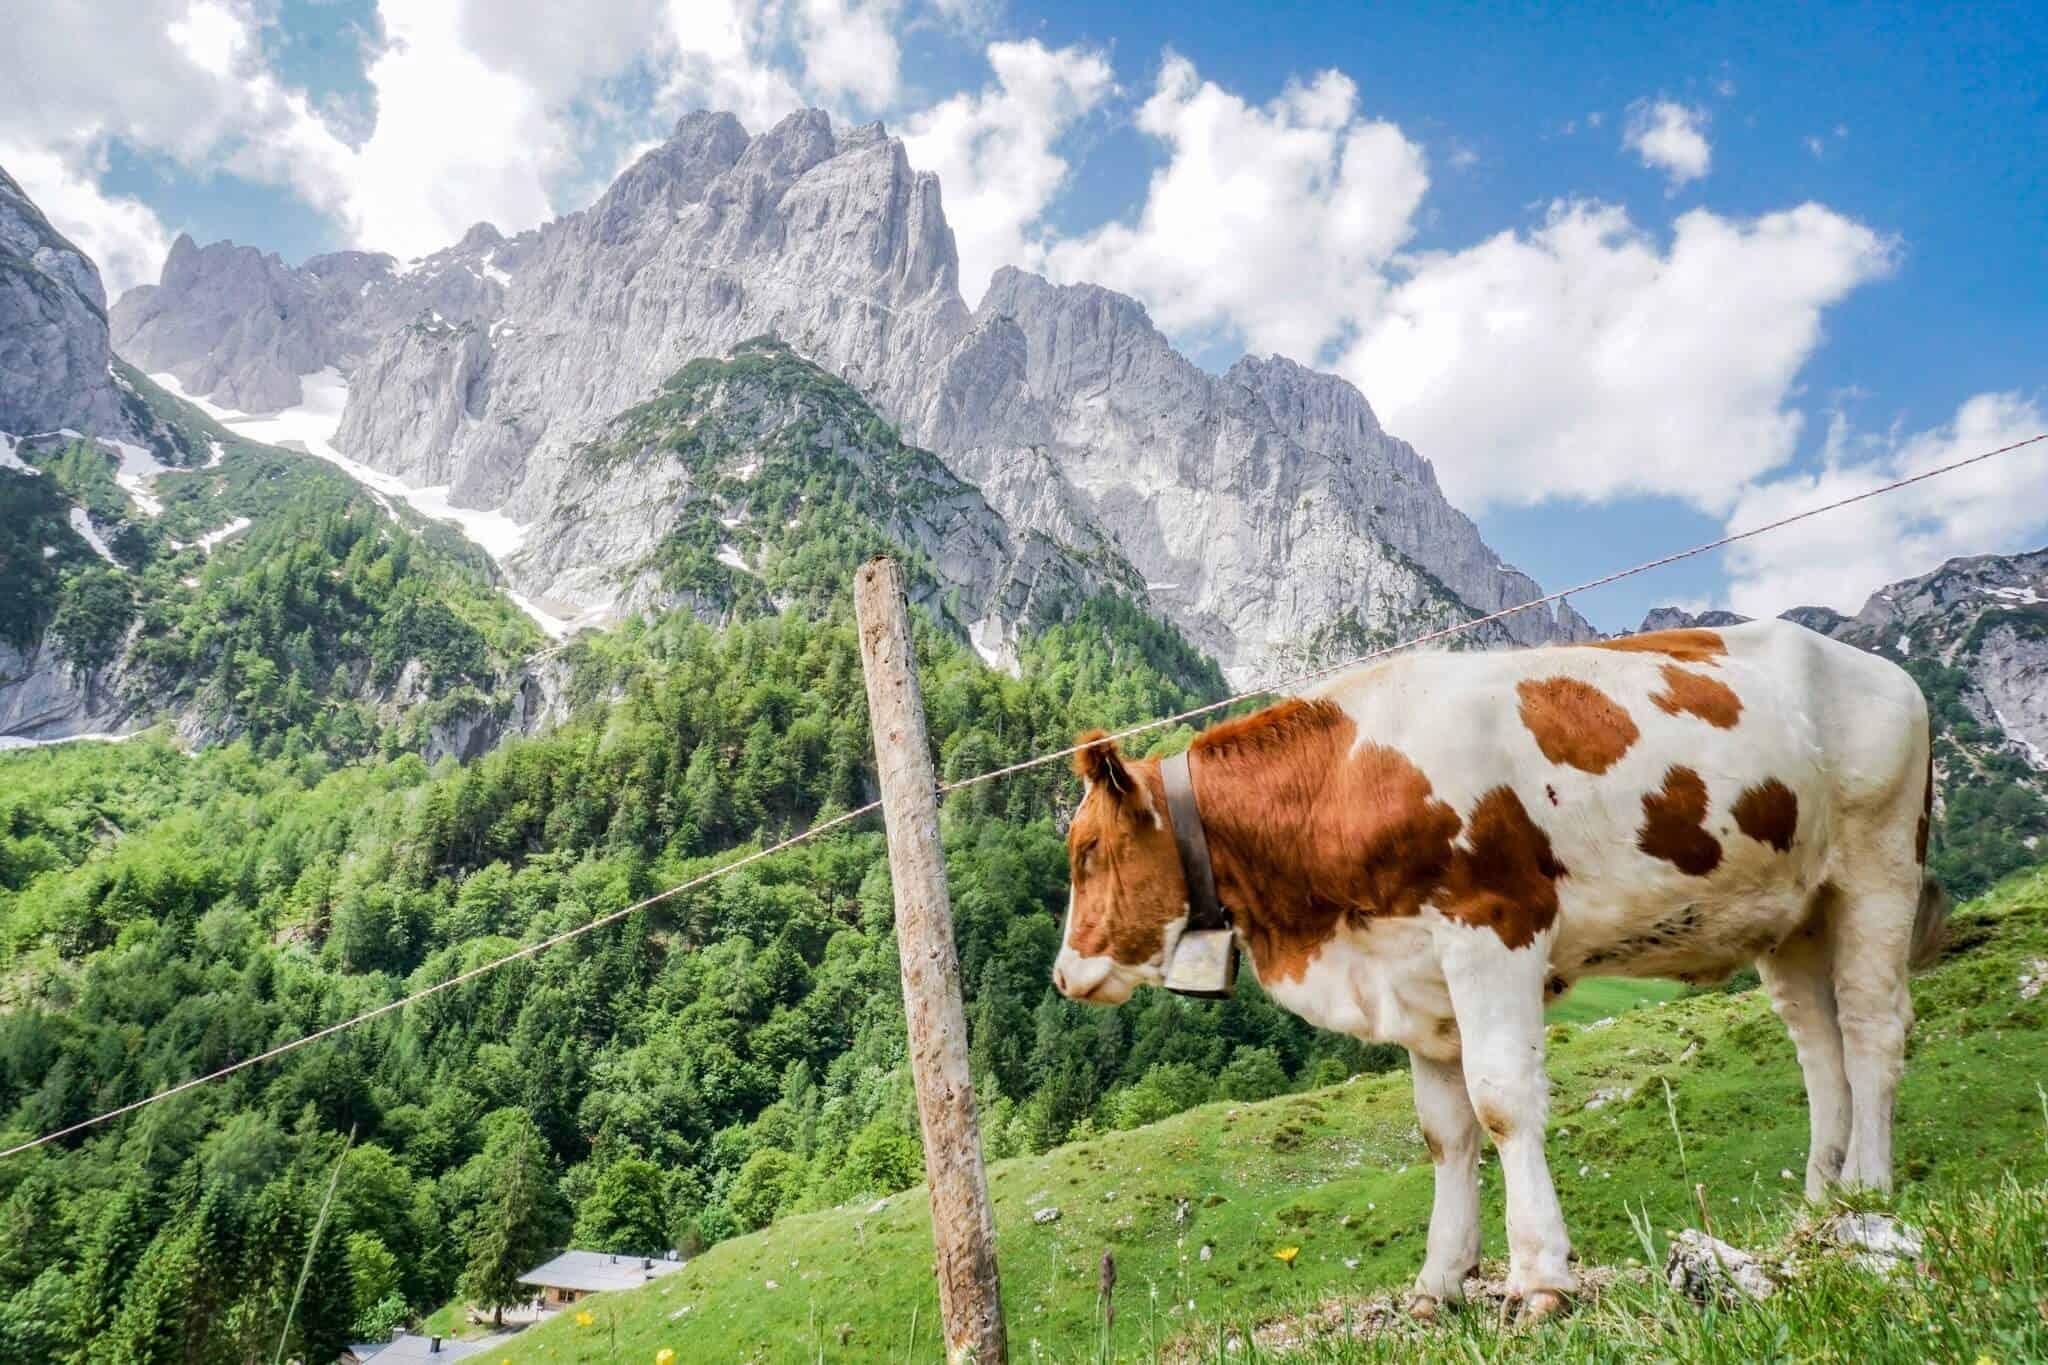 Kuh am Koasa Trail vorm Wilden Kaiser Etappe 2